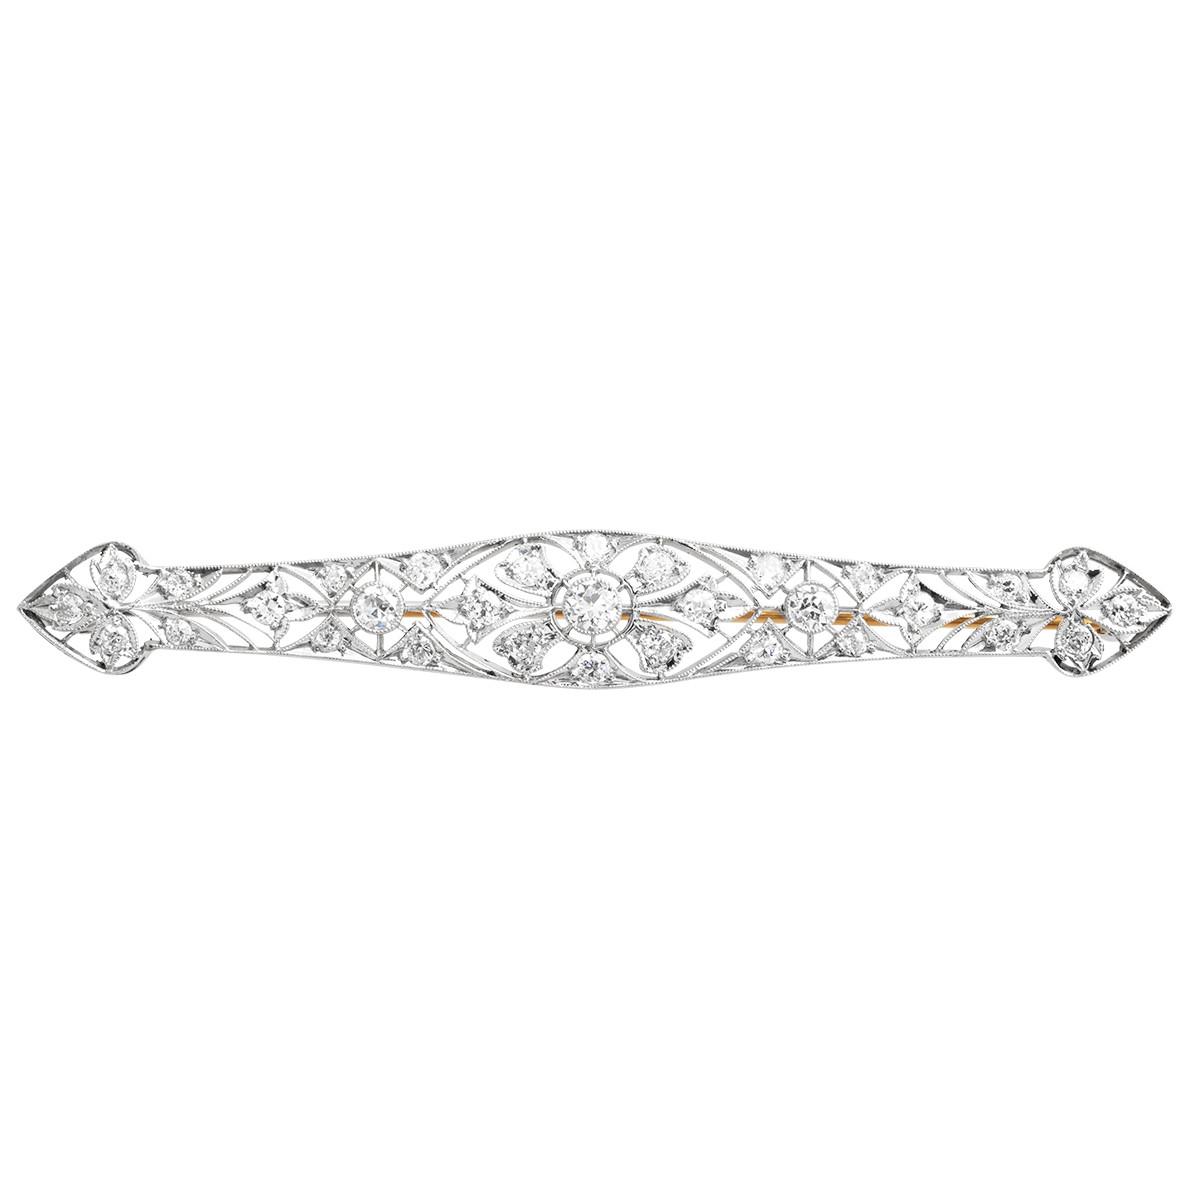 Antique 1.56 CTW Diamond Art Deco Brooch